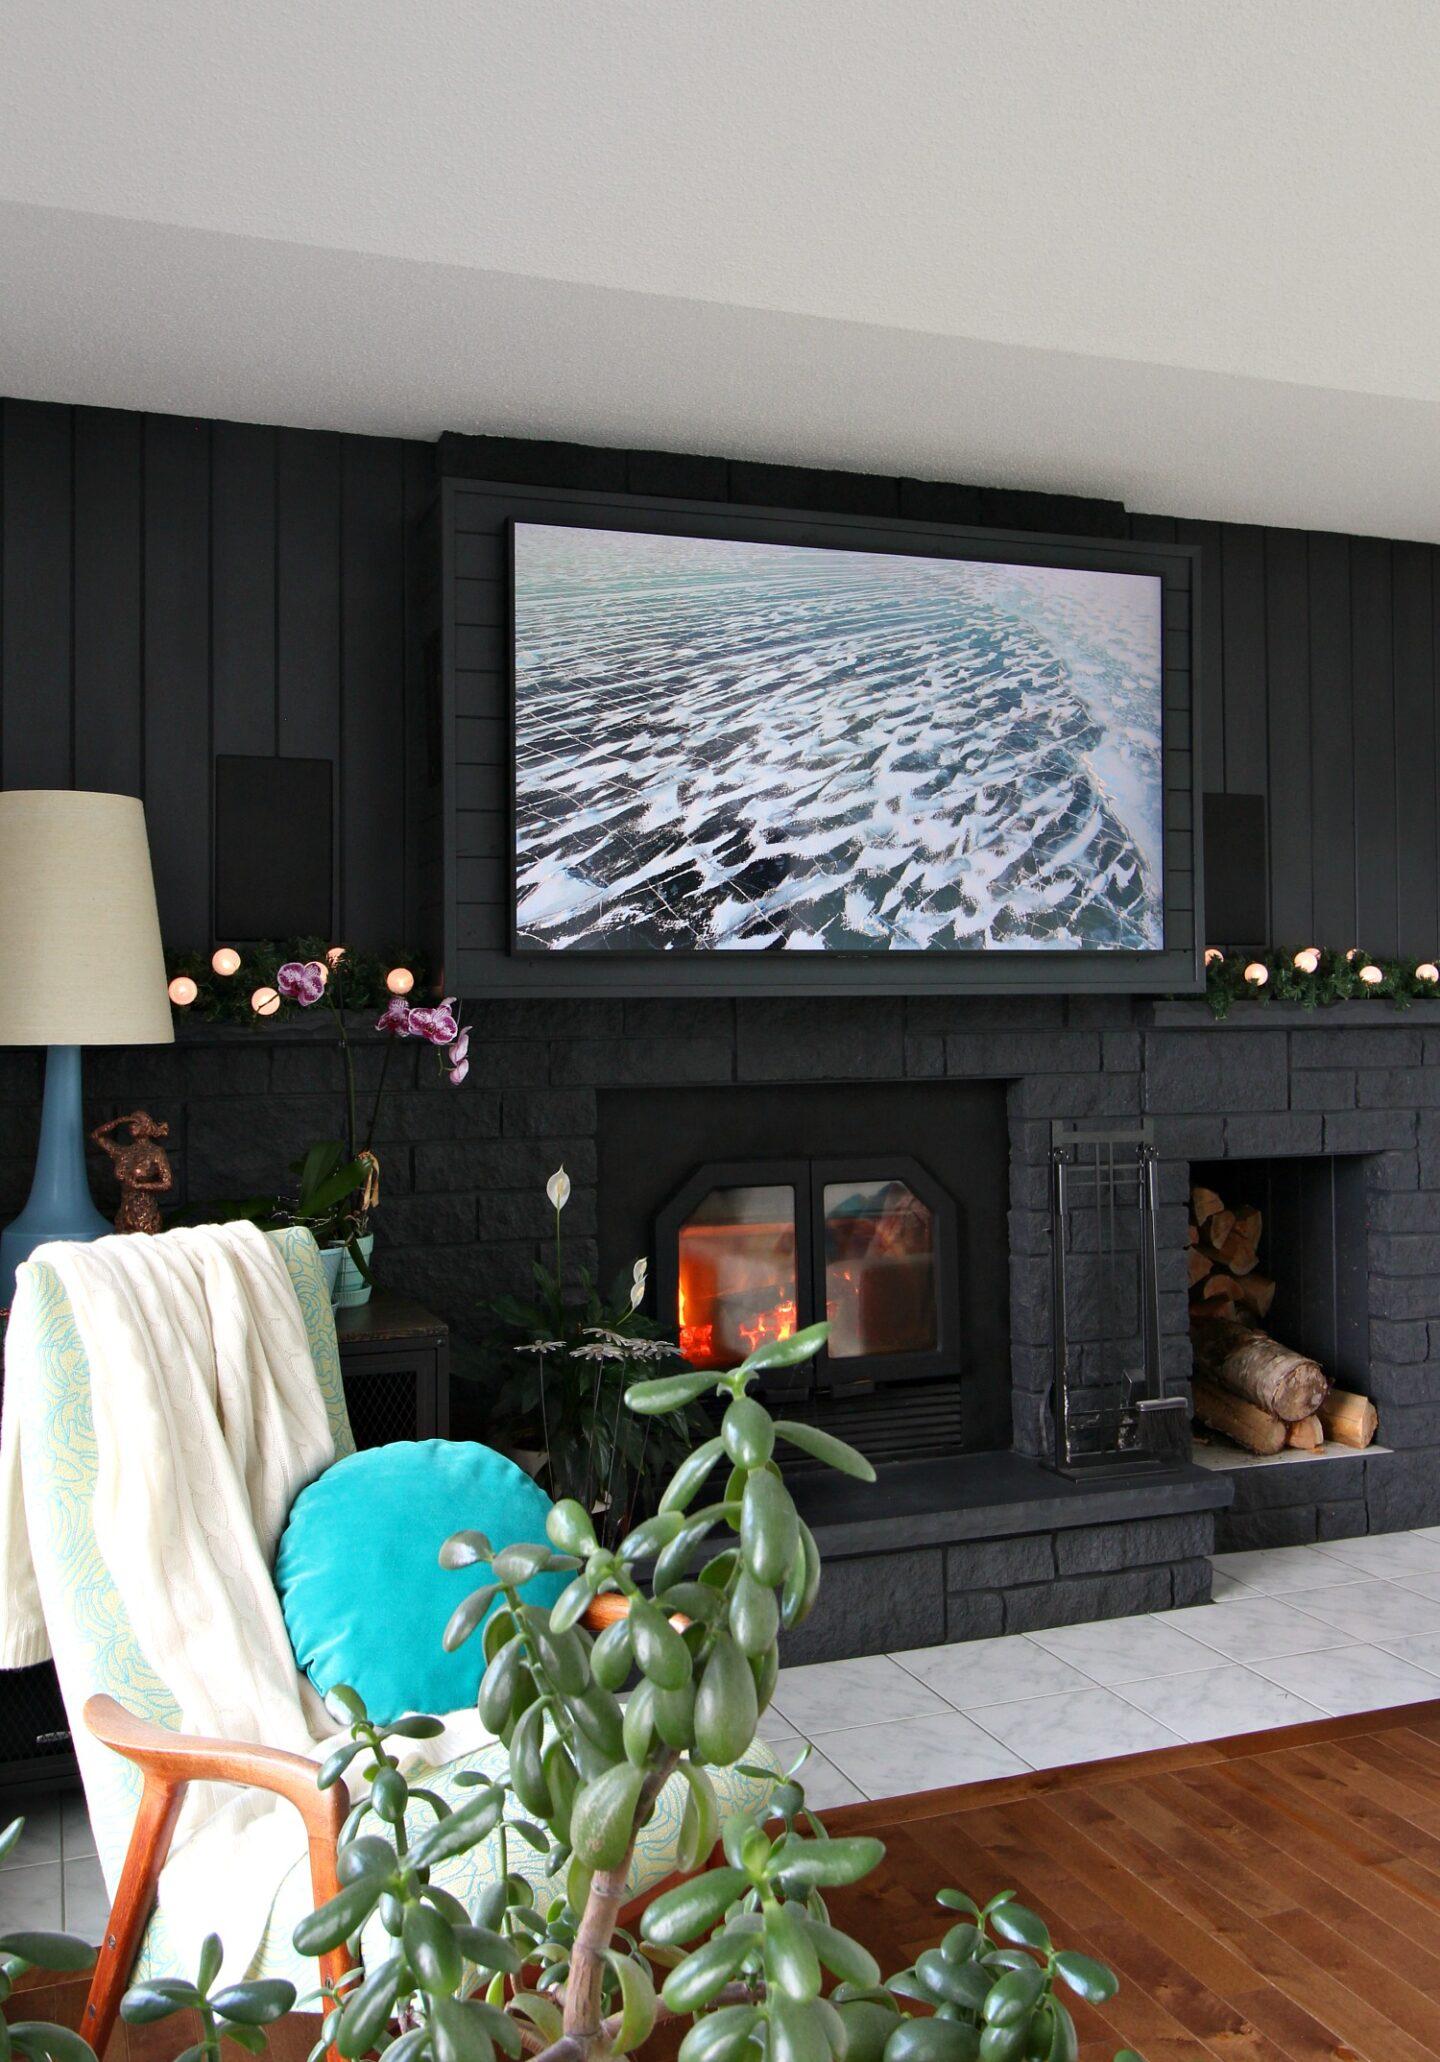 Black Painted Brick Fireplace and Minimalist Christmas Decor